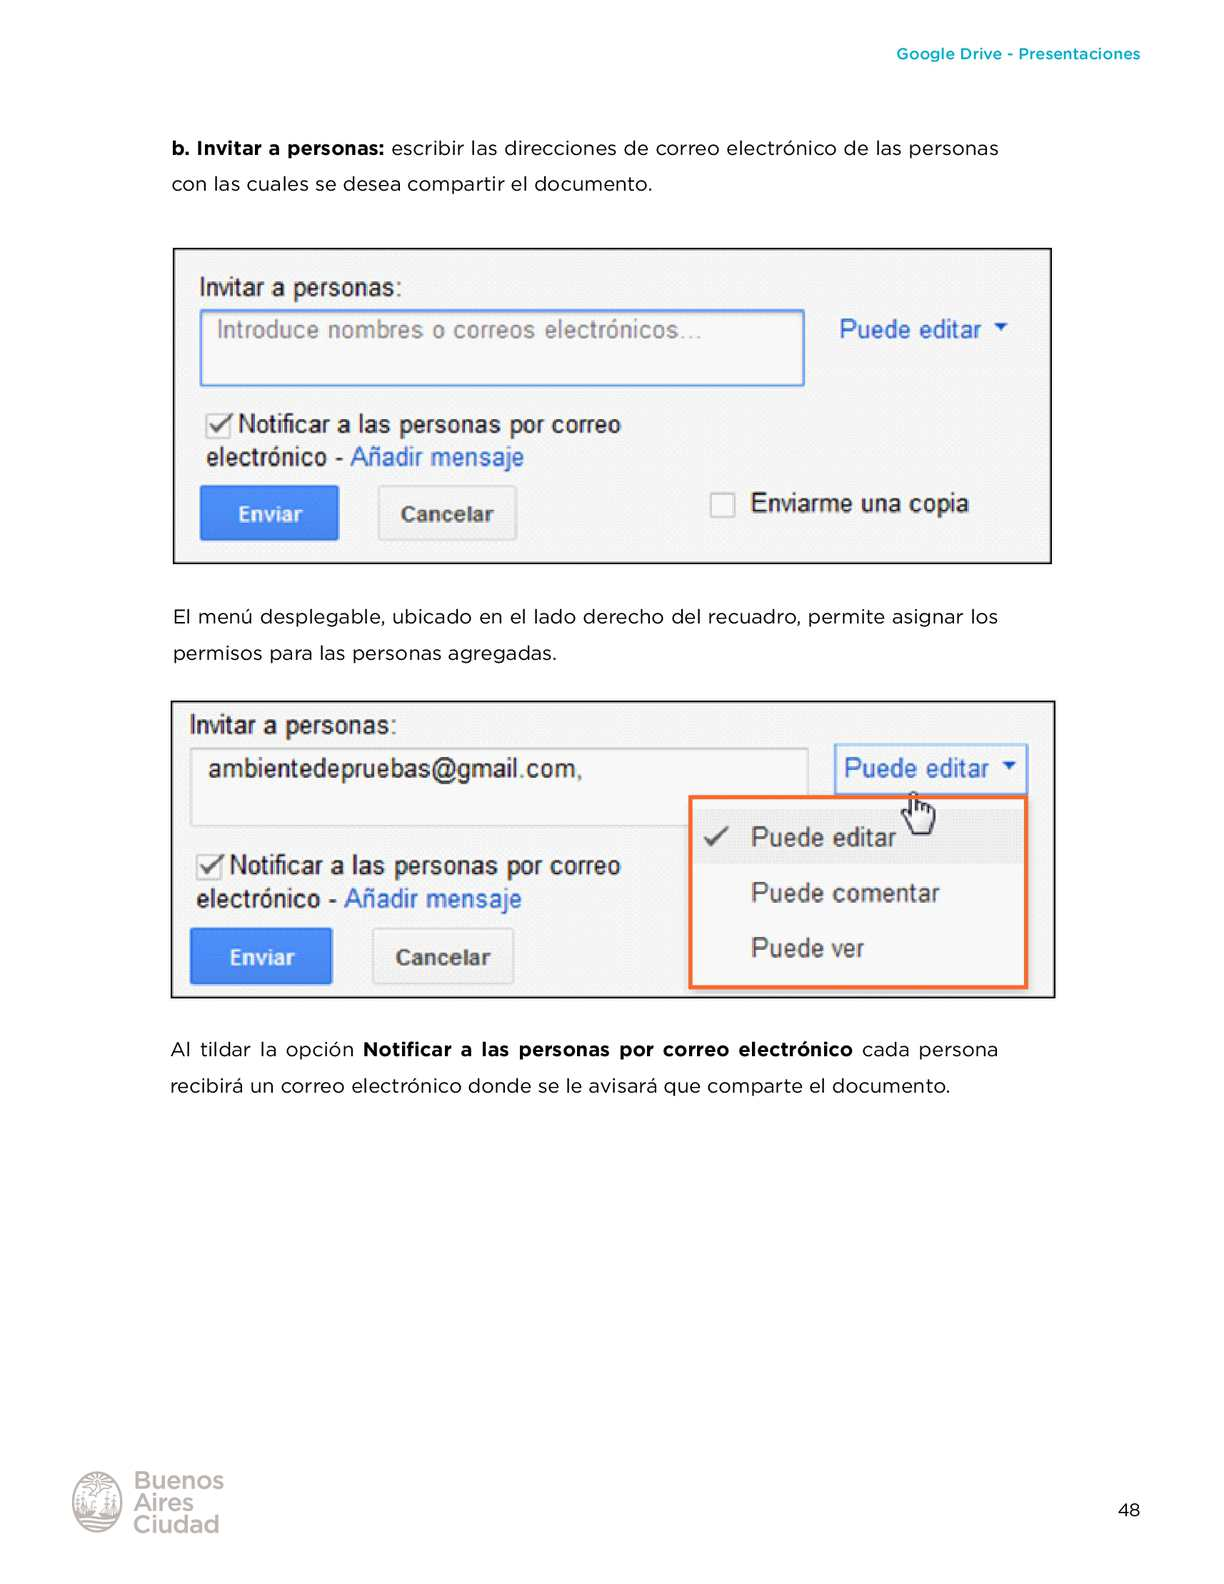 Tutorial Google Drive - Presentaciones - CALAMEO Downloader